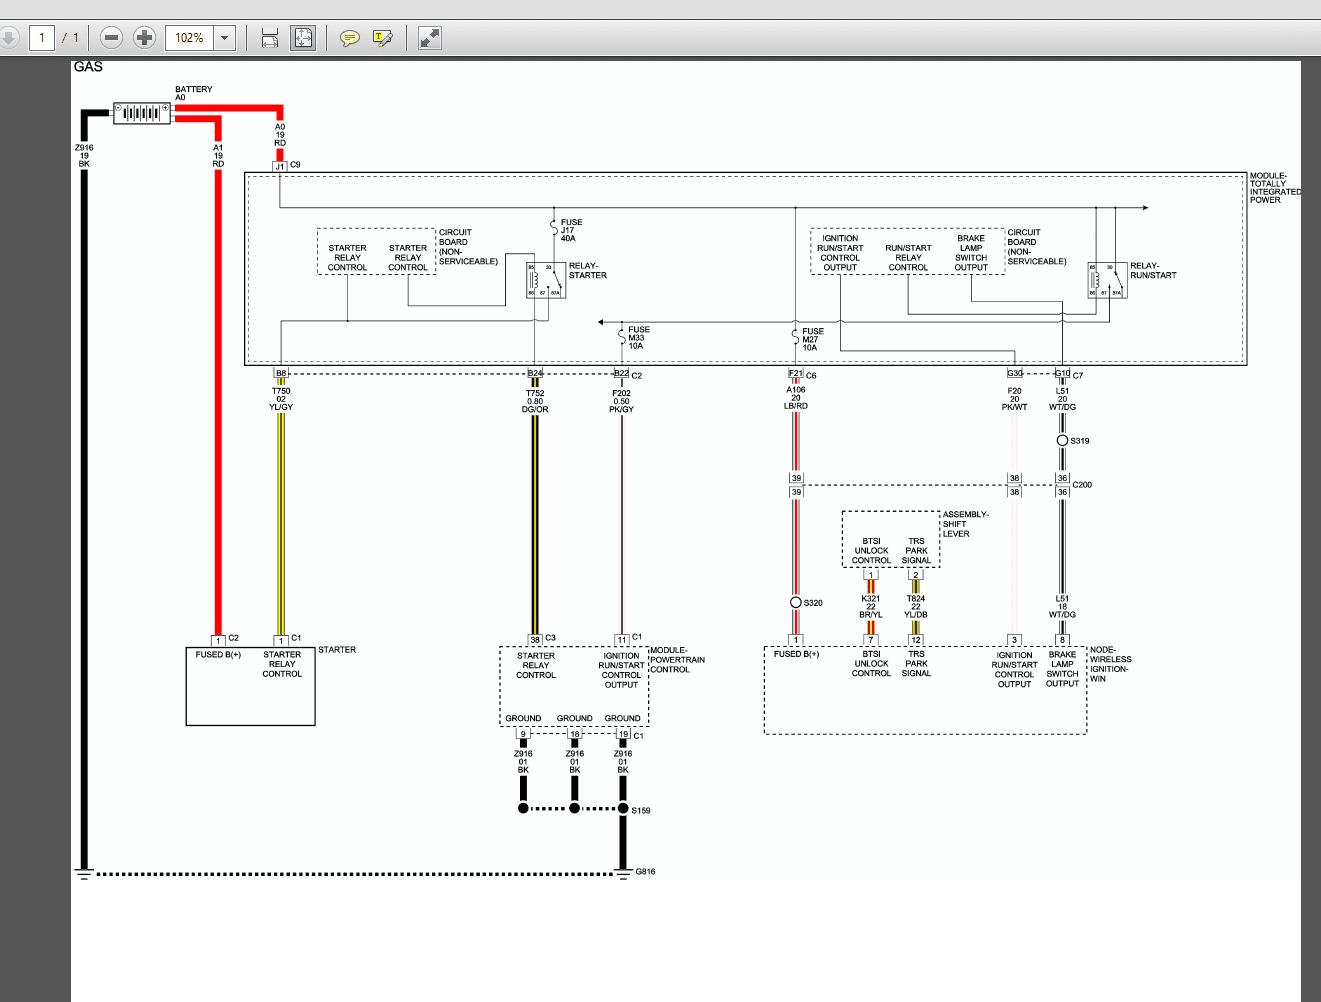 2015 Dodge Grand Caravan Wiring Diagram - Wiring Diagram All free-core -  free-core.huevoprint.it   2015 Dodge Grand Caravan Wiring Diagram      Huevoprint